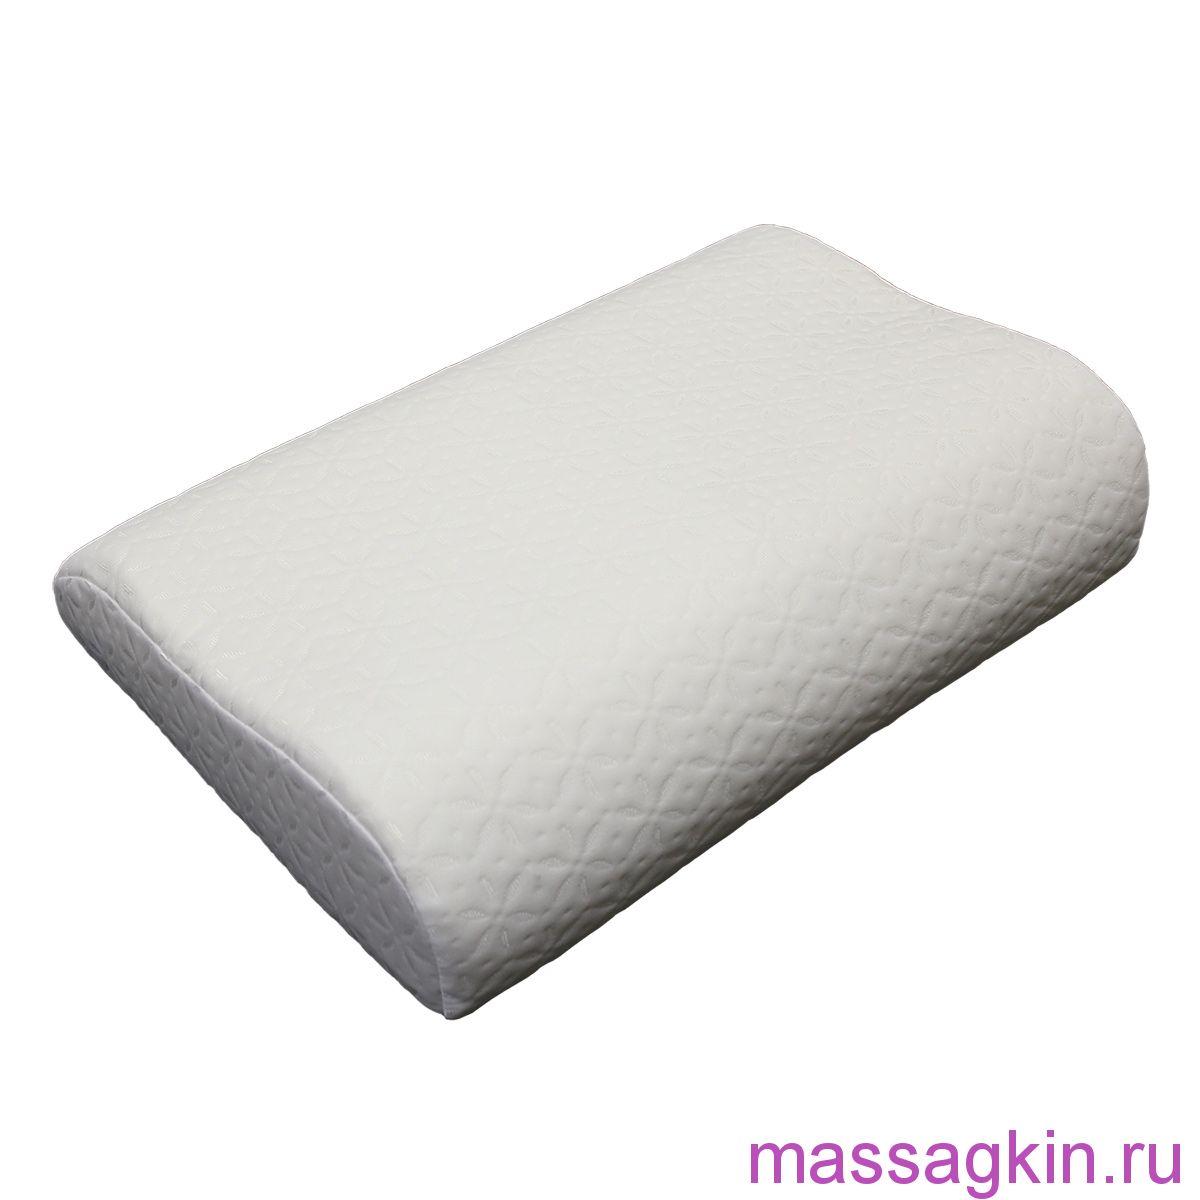 Подушка с эффектом памяти Memory PLUS (60*40*11/13)